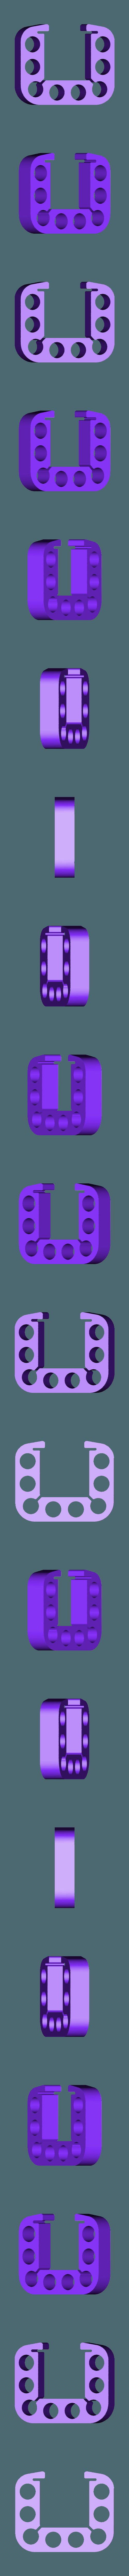 Nozzle_Rack_8_v2-1.STL Download free STL file 2020 Nozzle Rack 8 • 3D print object, WalterHsiao